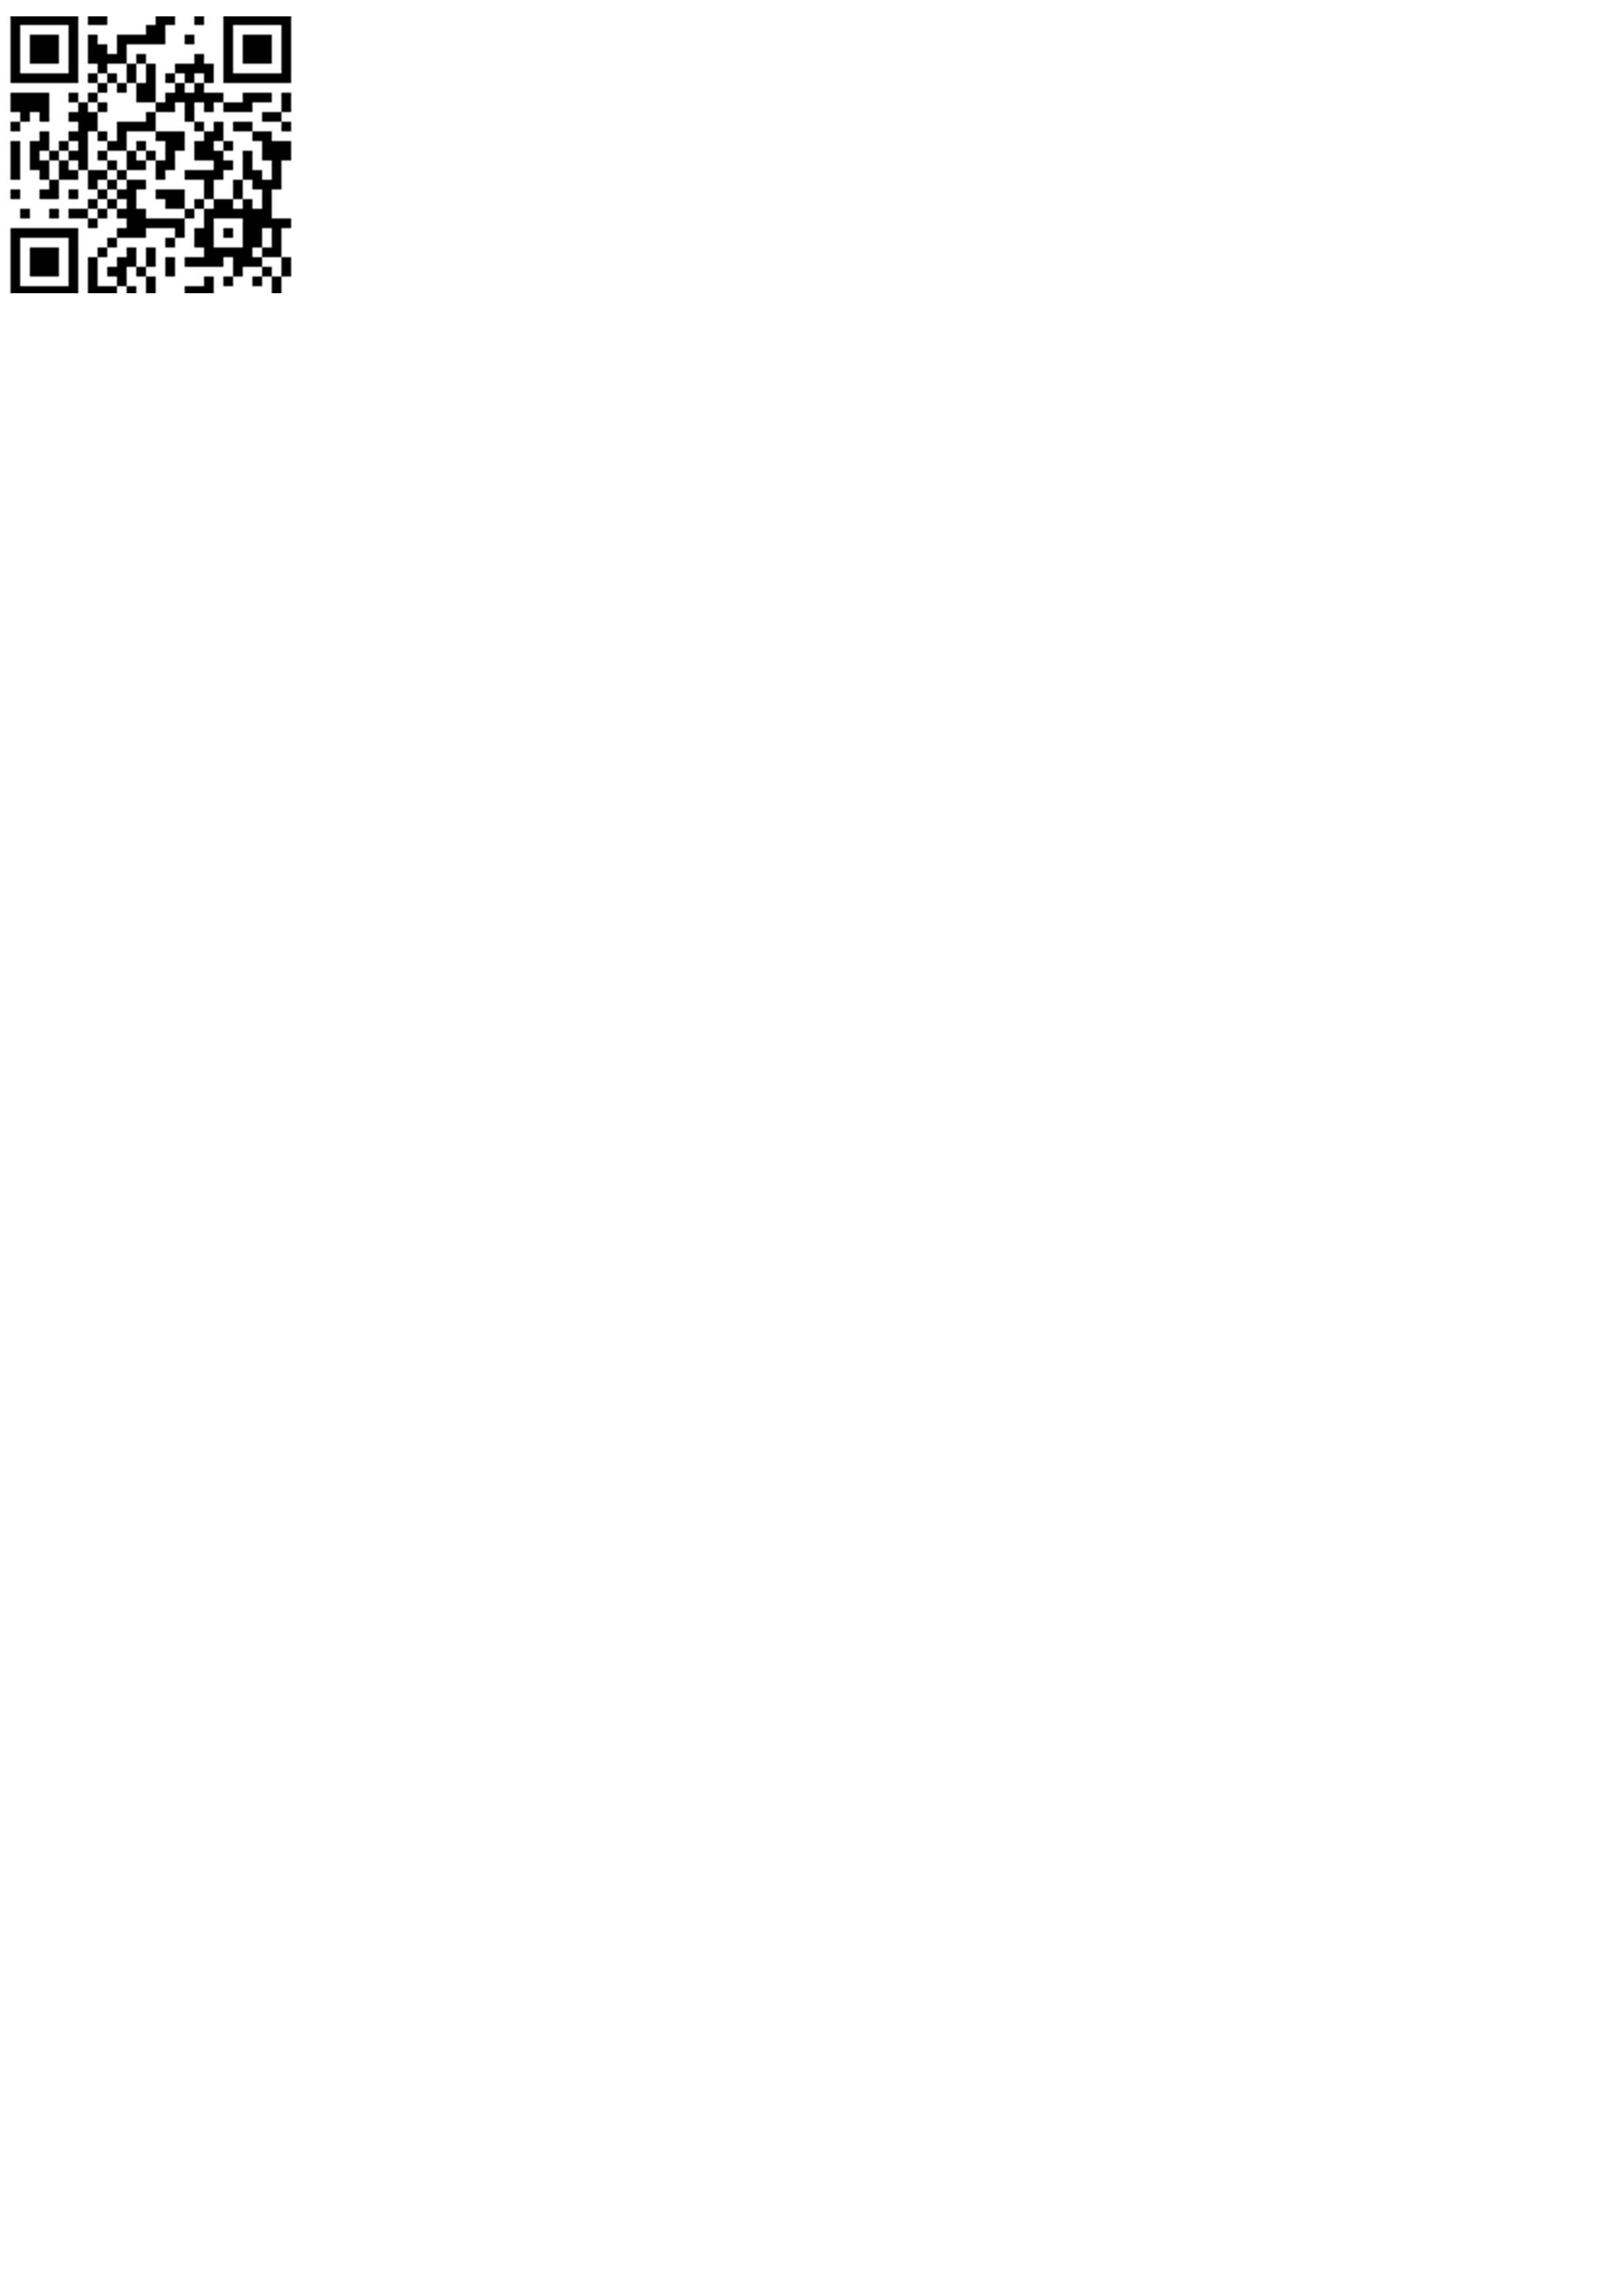 Microsoft Word - アンケート QRコード.jpg